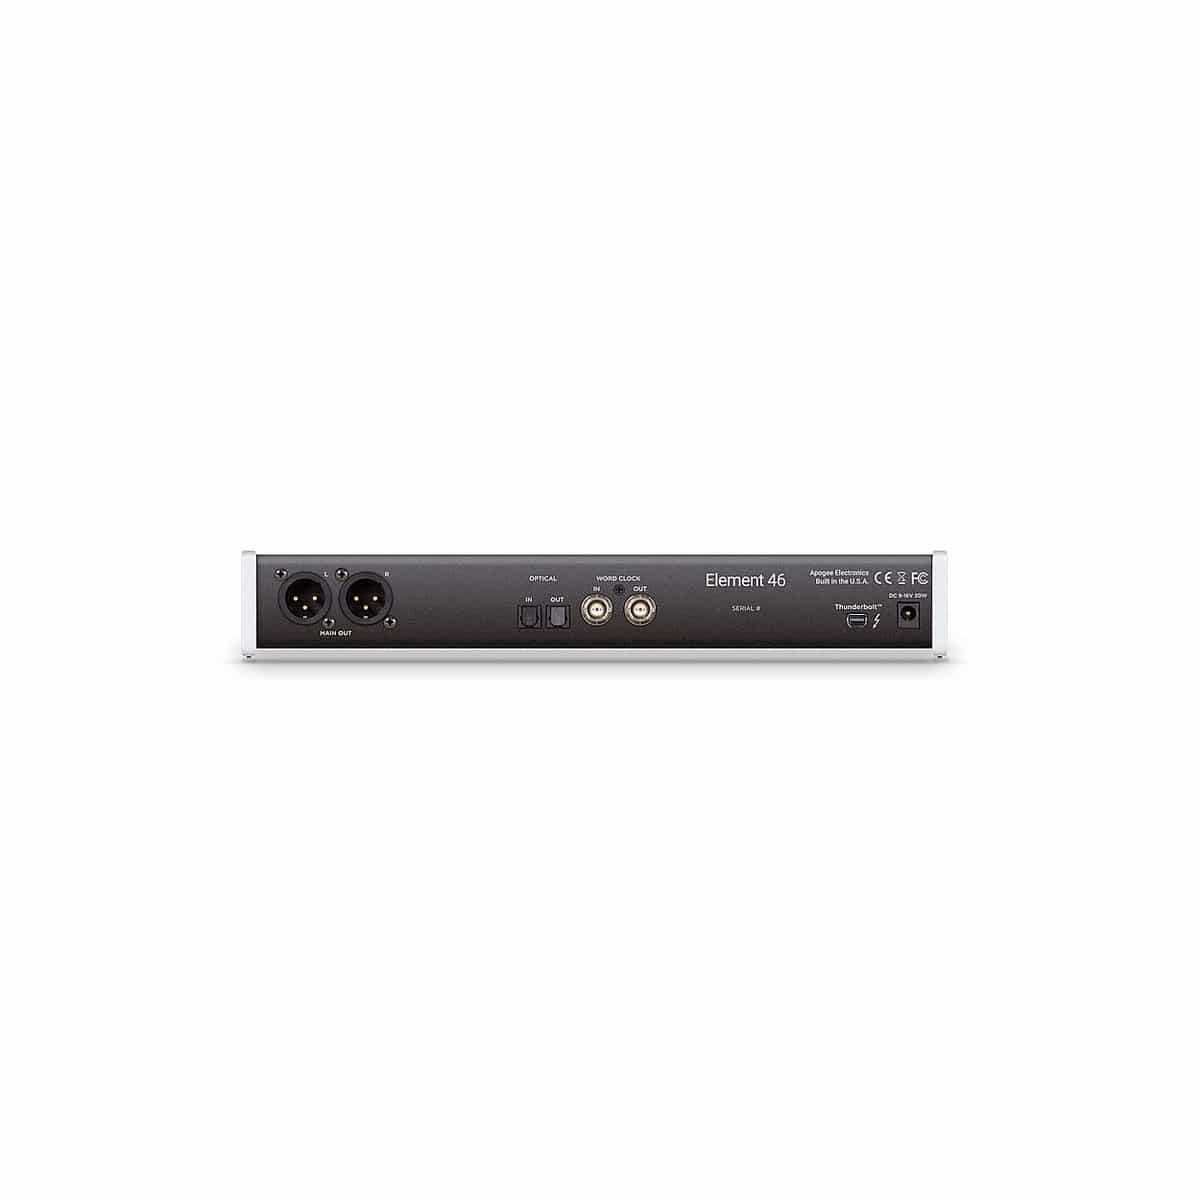 Apogee Element 46 03 Pro Audio, Audio Digitale, Schede Audio per PC e MAC